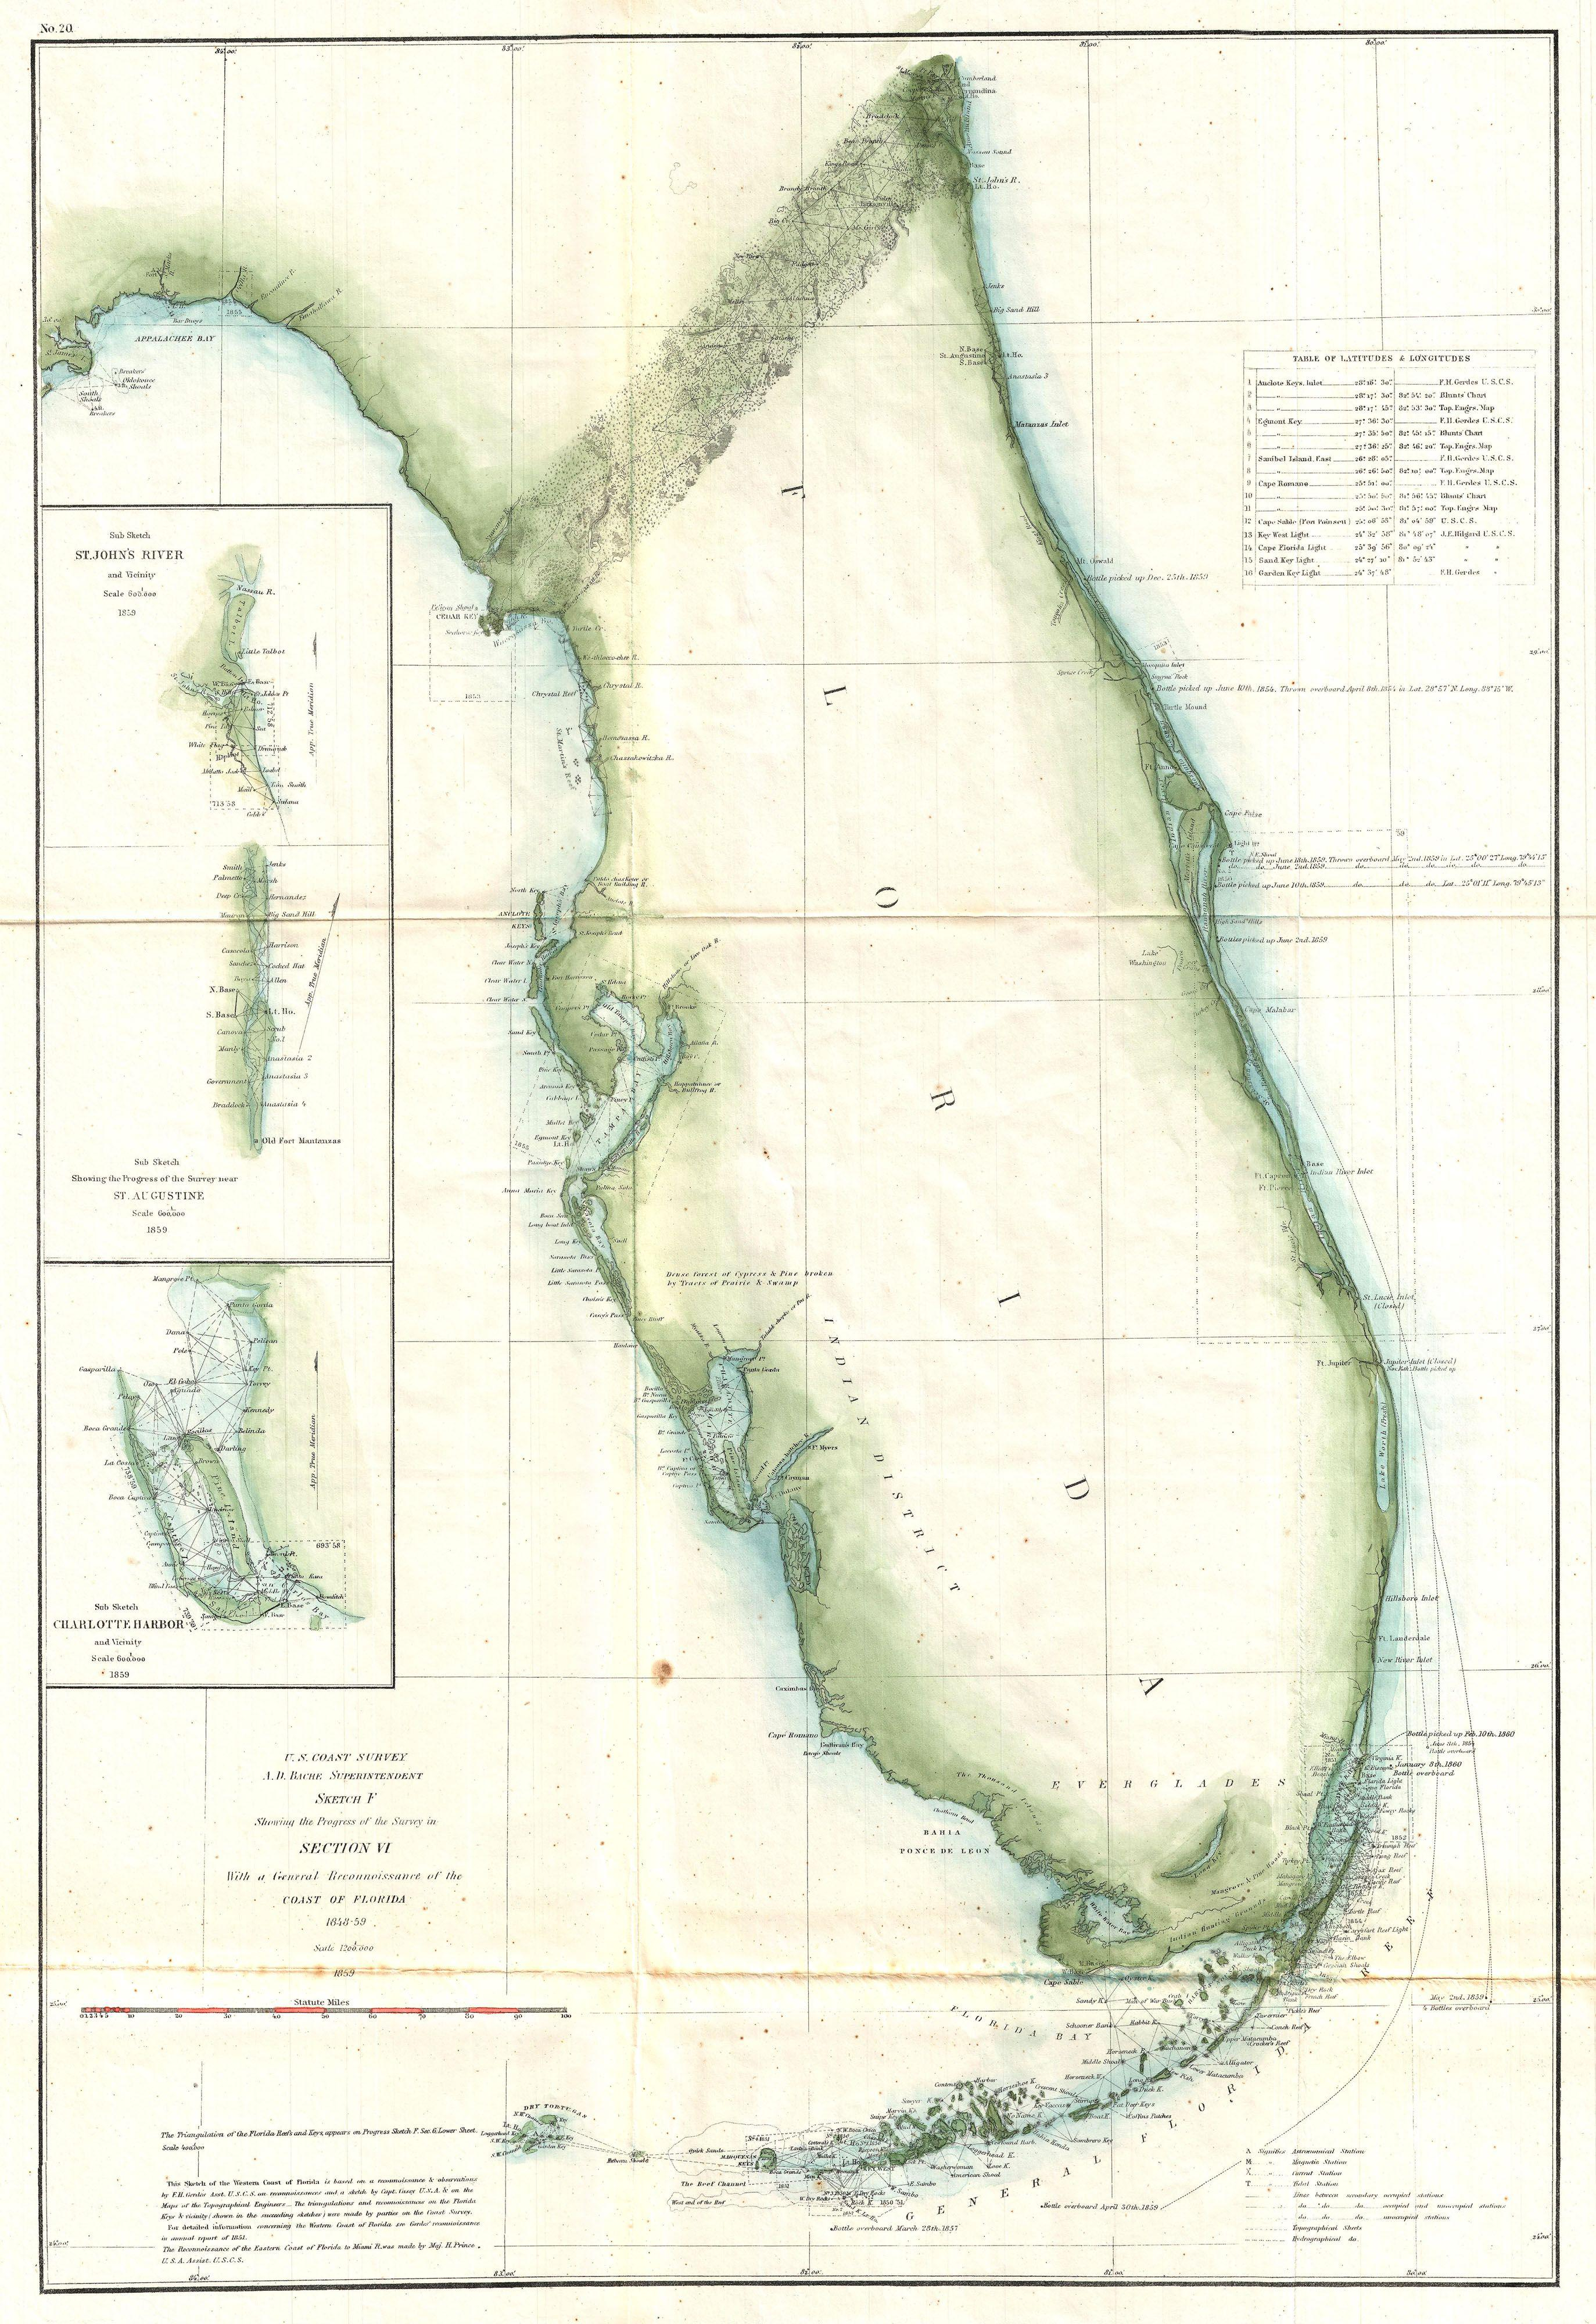 Florida Coastline Map.File 1859 U S Coast Survey Map Of Florida Geographicus Florida